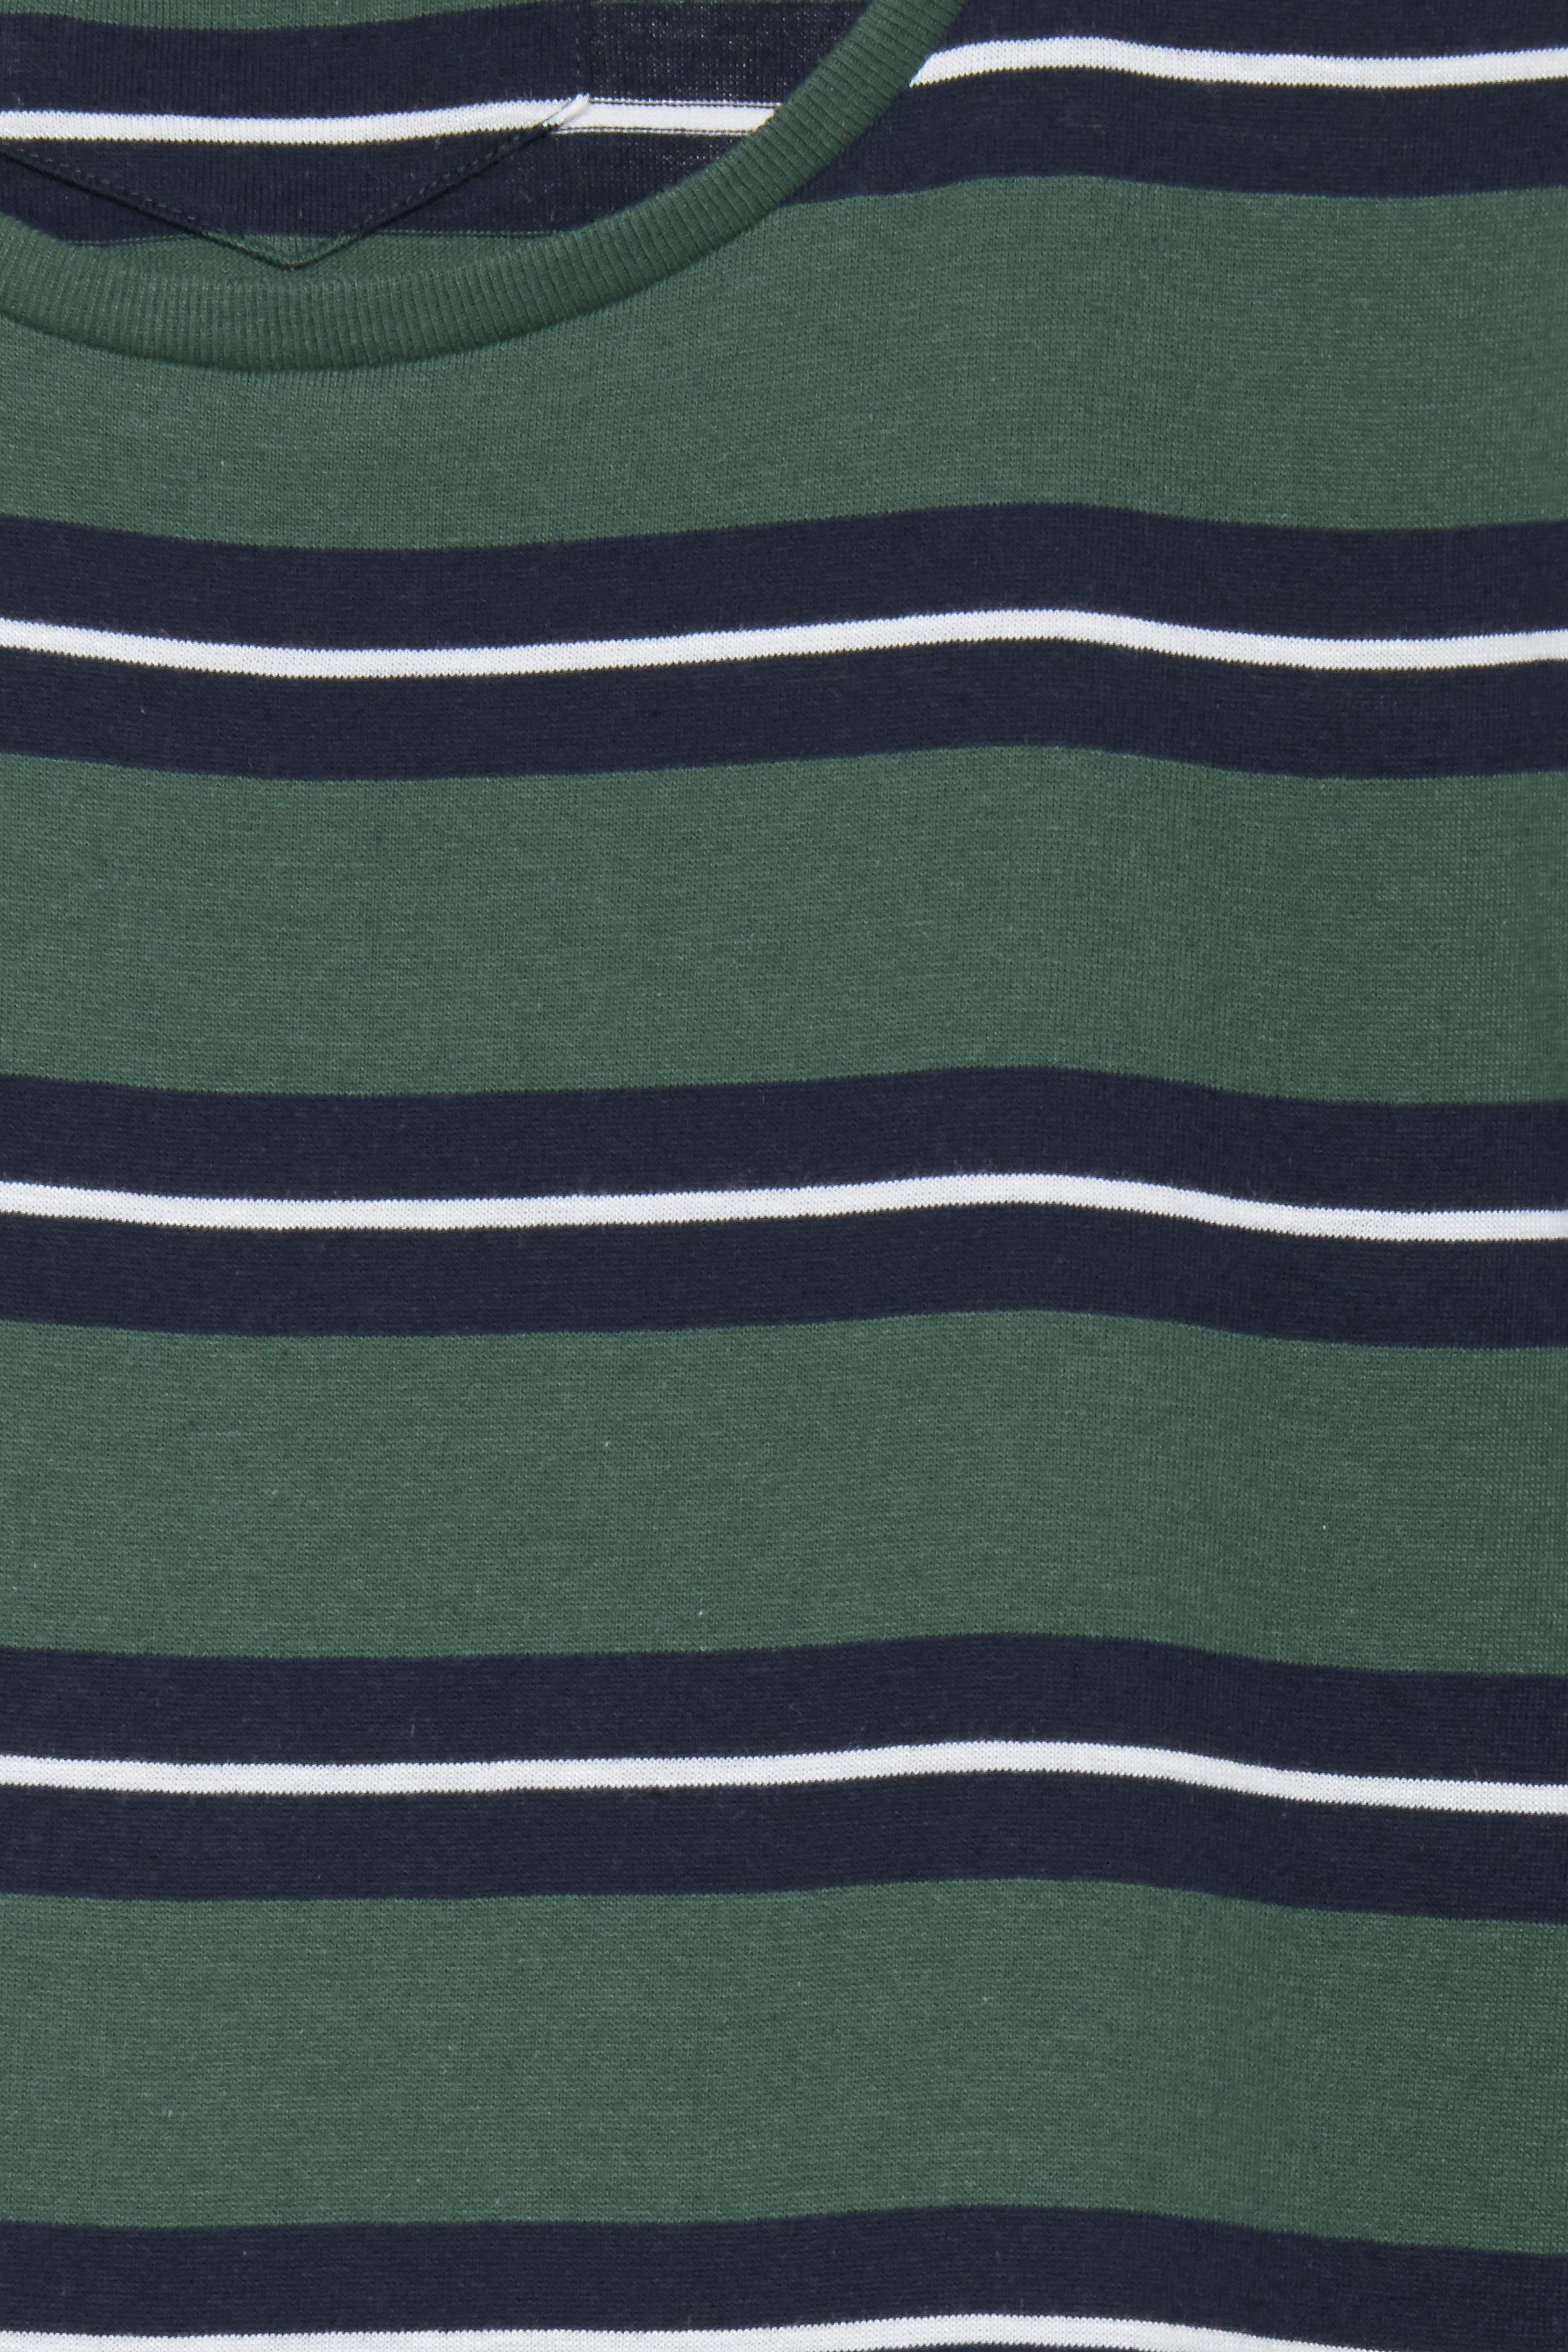 Pine Green T-Shirt fra Casual Friday – Køb Pine Green T-Shirt fra str. S-3XL her